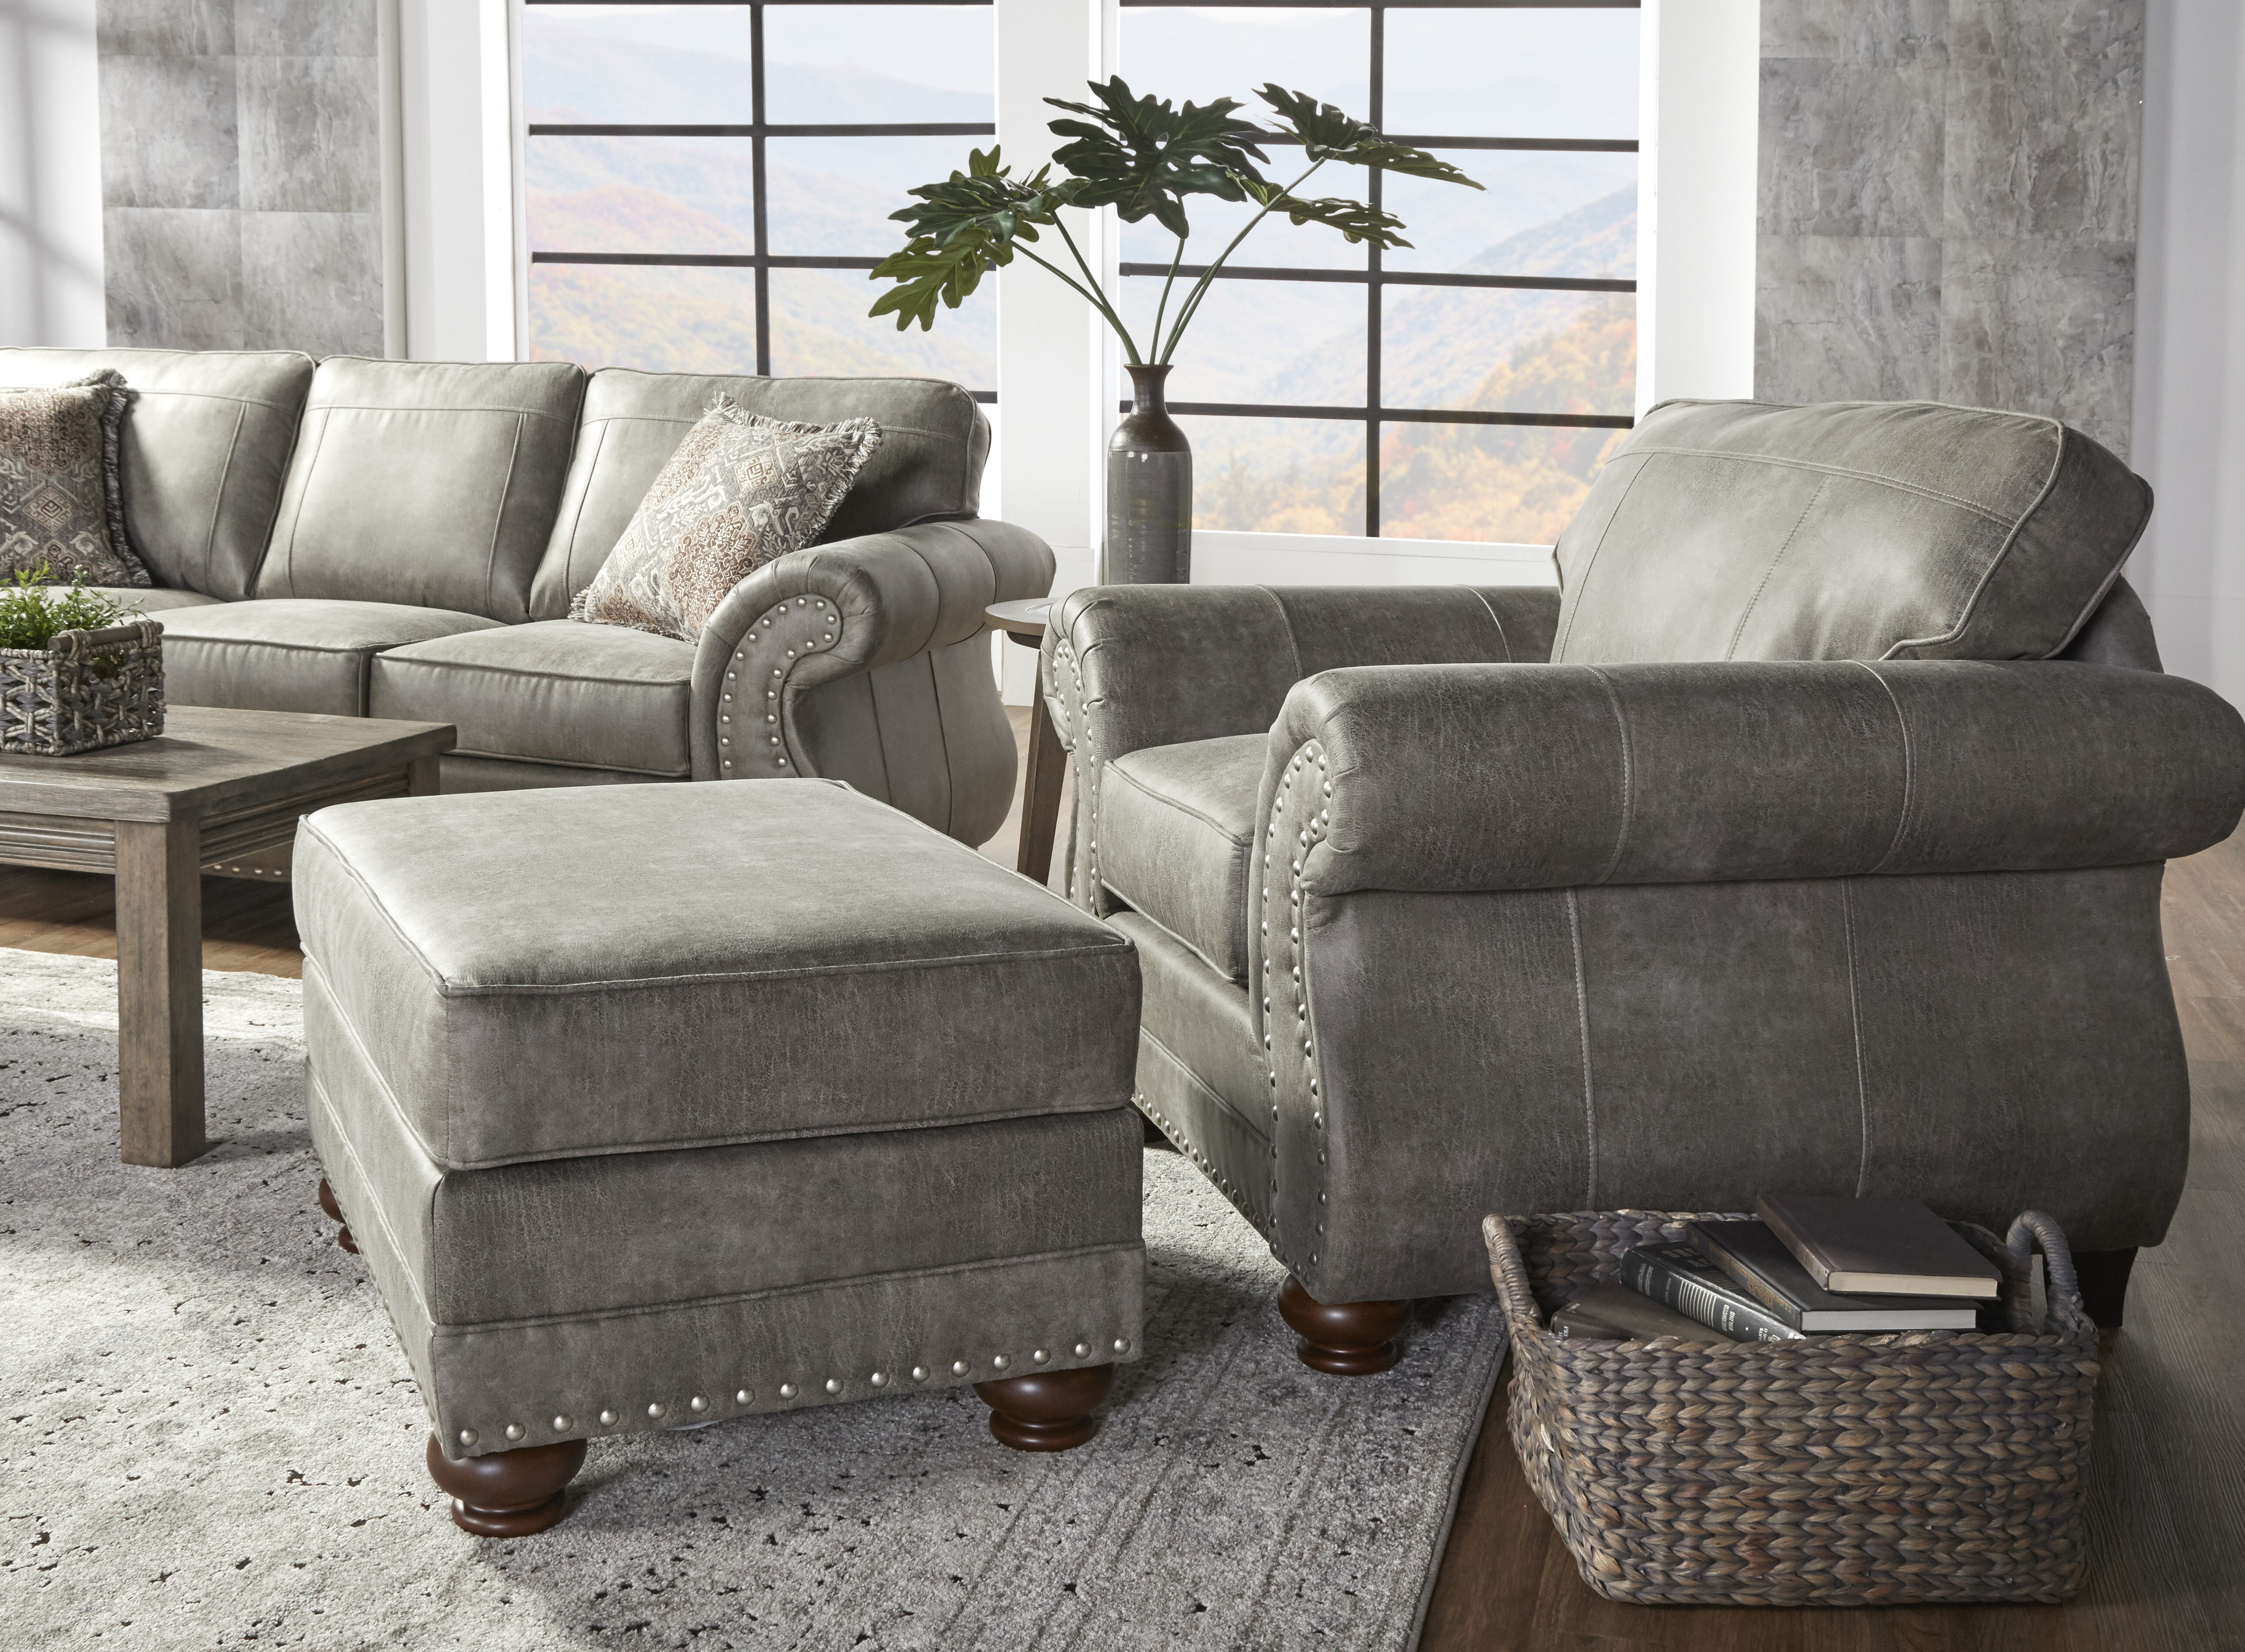 macalla armchair and ottoman